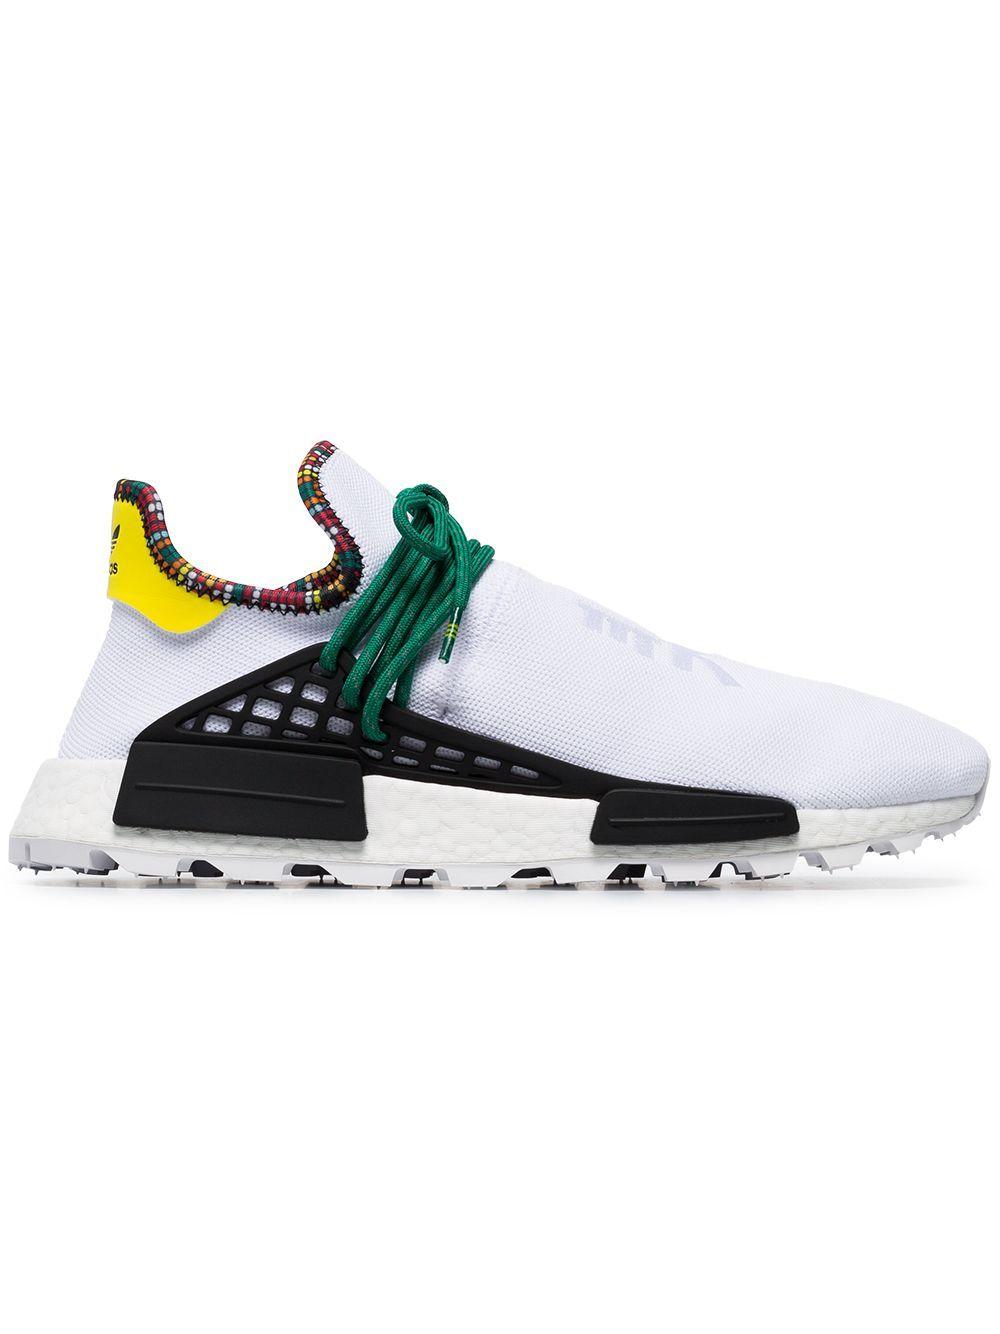 Adidas Originals Adidas By Pharrell